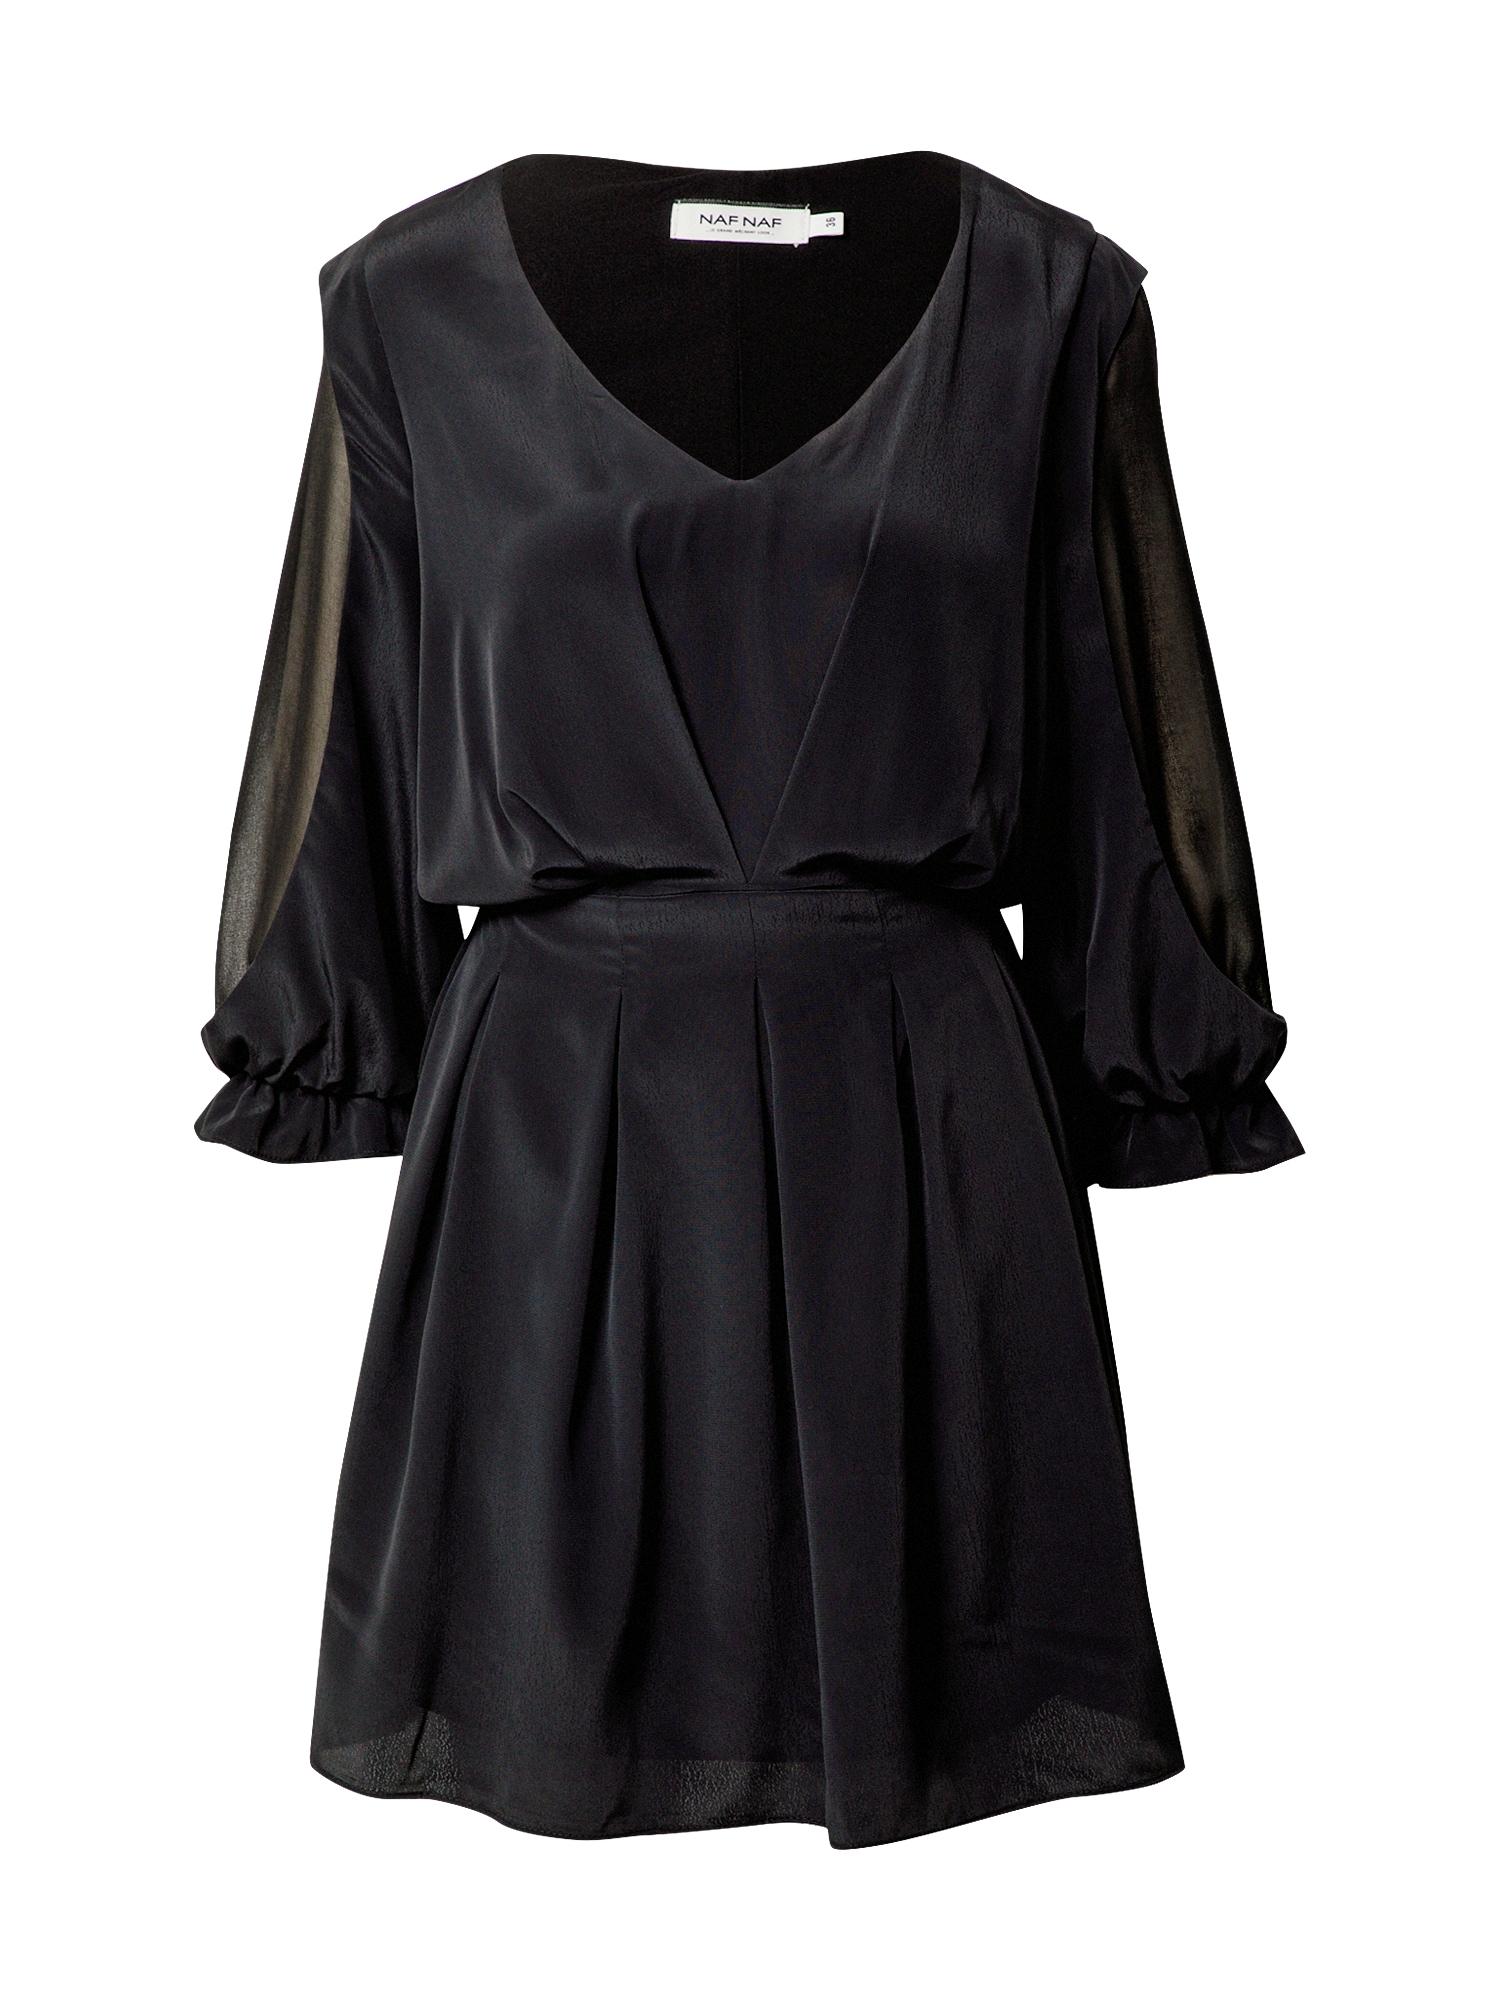 NAF NAF Kokteilinė suknelė juoda